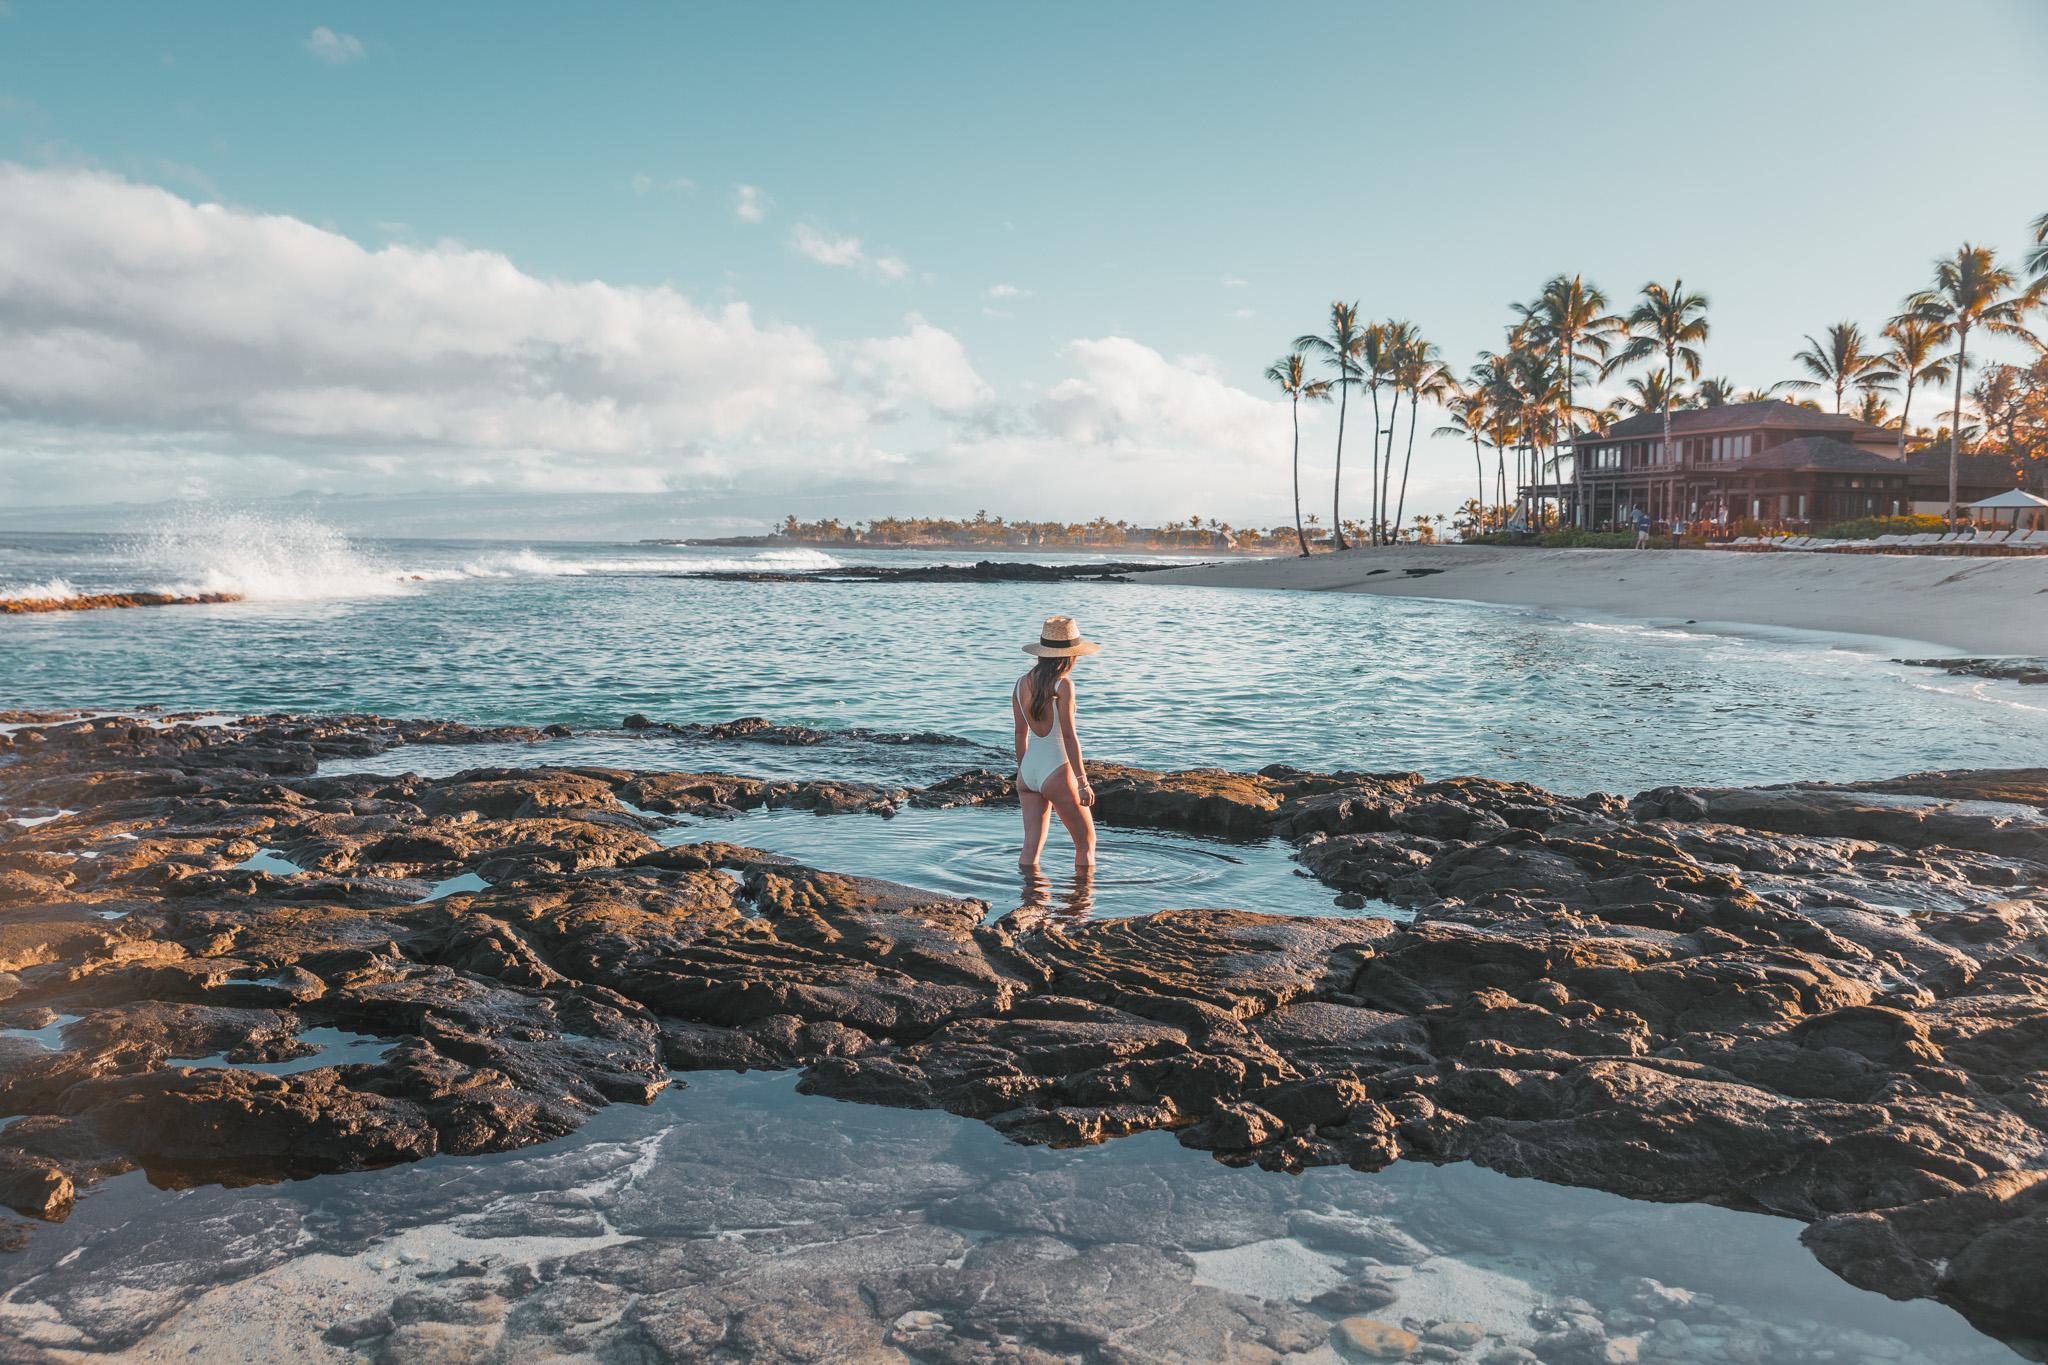 Ocean pools // A Luxury Stay on the Big Island: Four Seasons Resort Hualalai // #readysetjetset #hawaii #bigisland #luxuryhotels #beachresorts #usa #travel